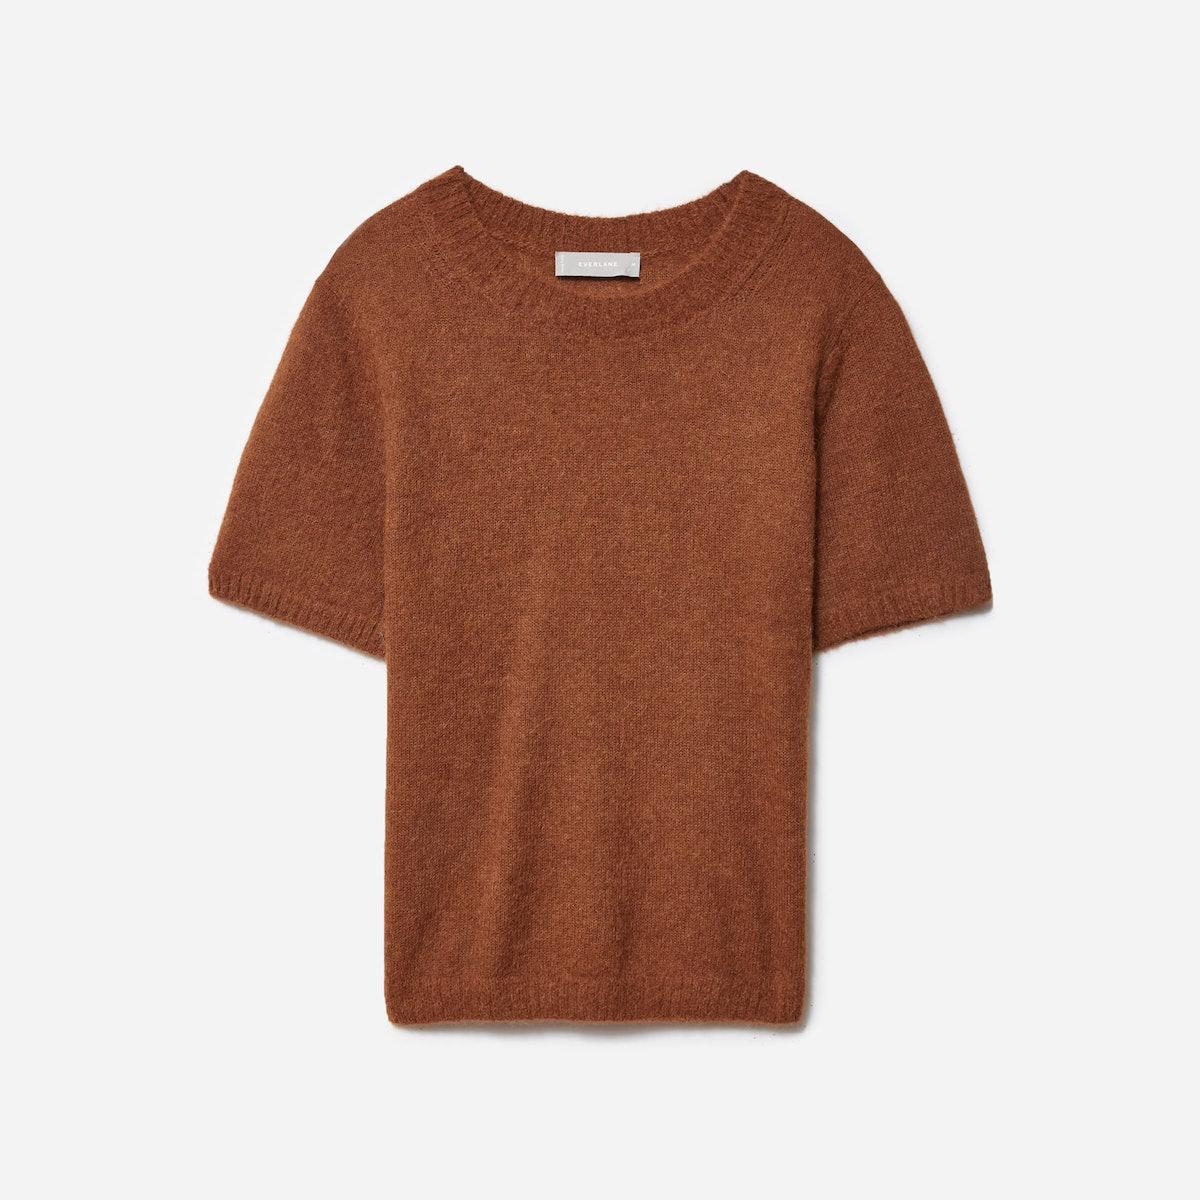 Alpaca Sweater Tee